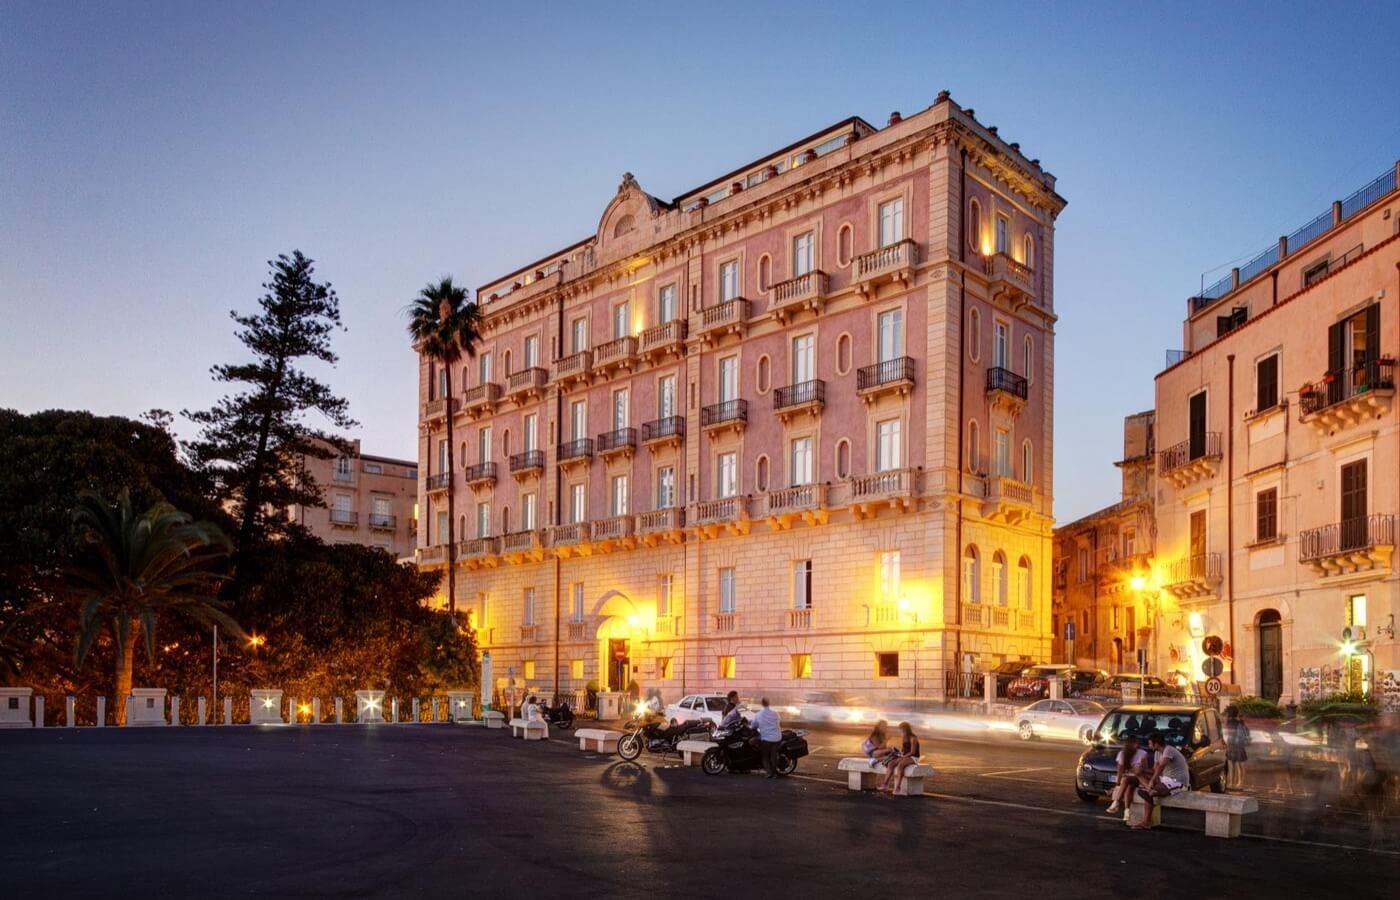 Investimenti alberghieri in Italia: l'Hotel Des Etragers & SPA di Siracusa venduto a ottobre 2017